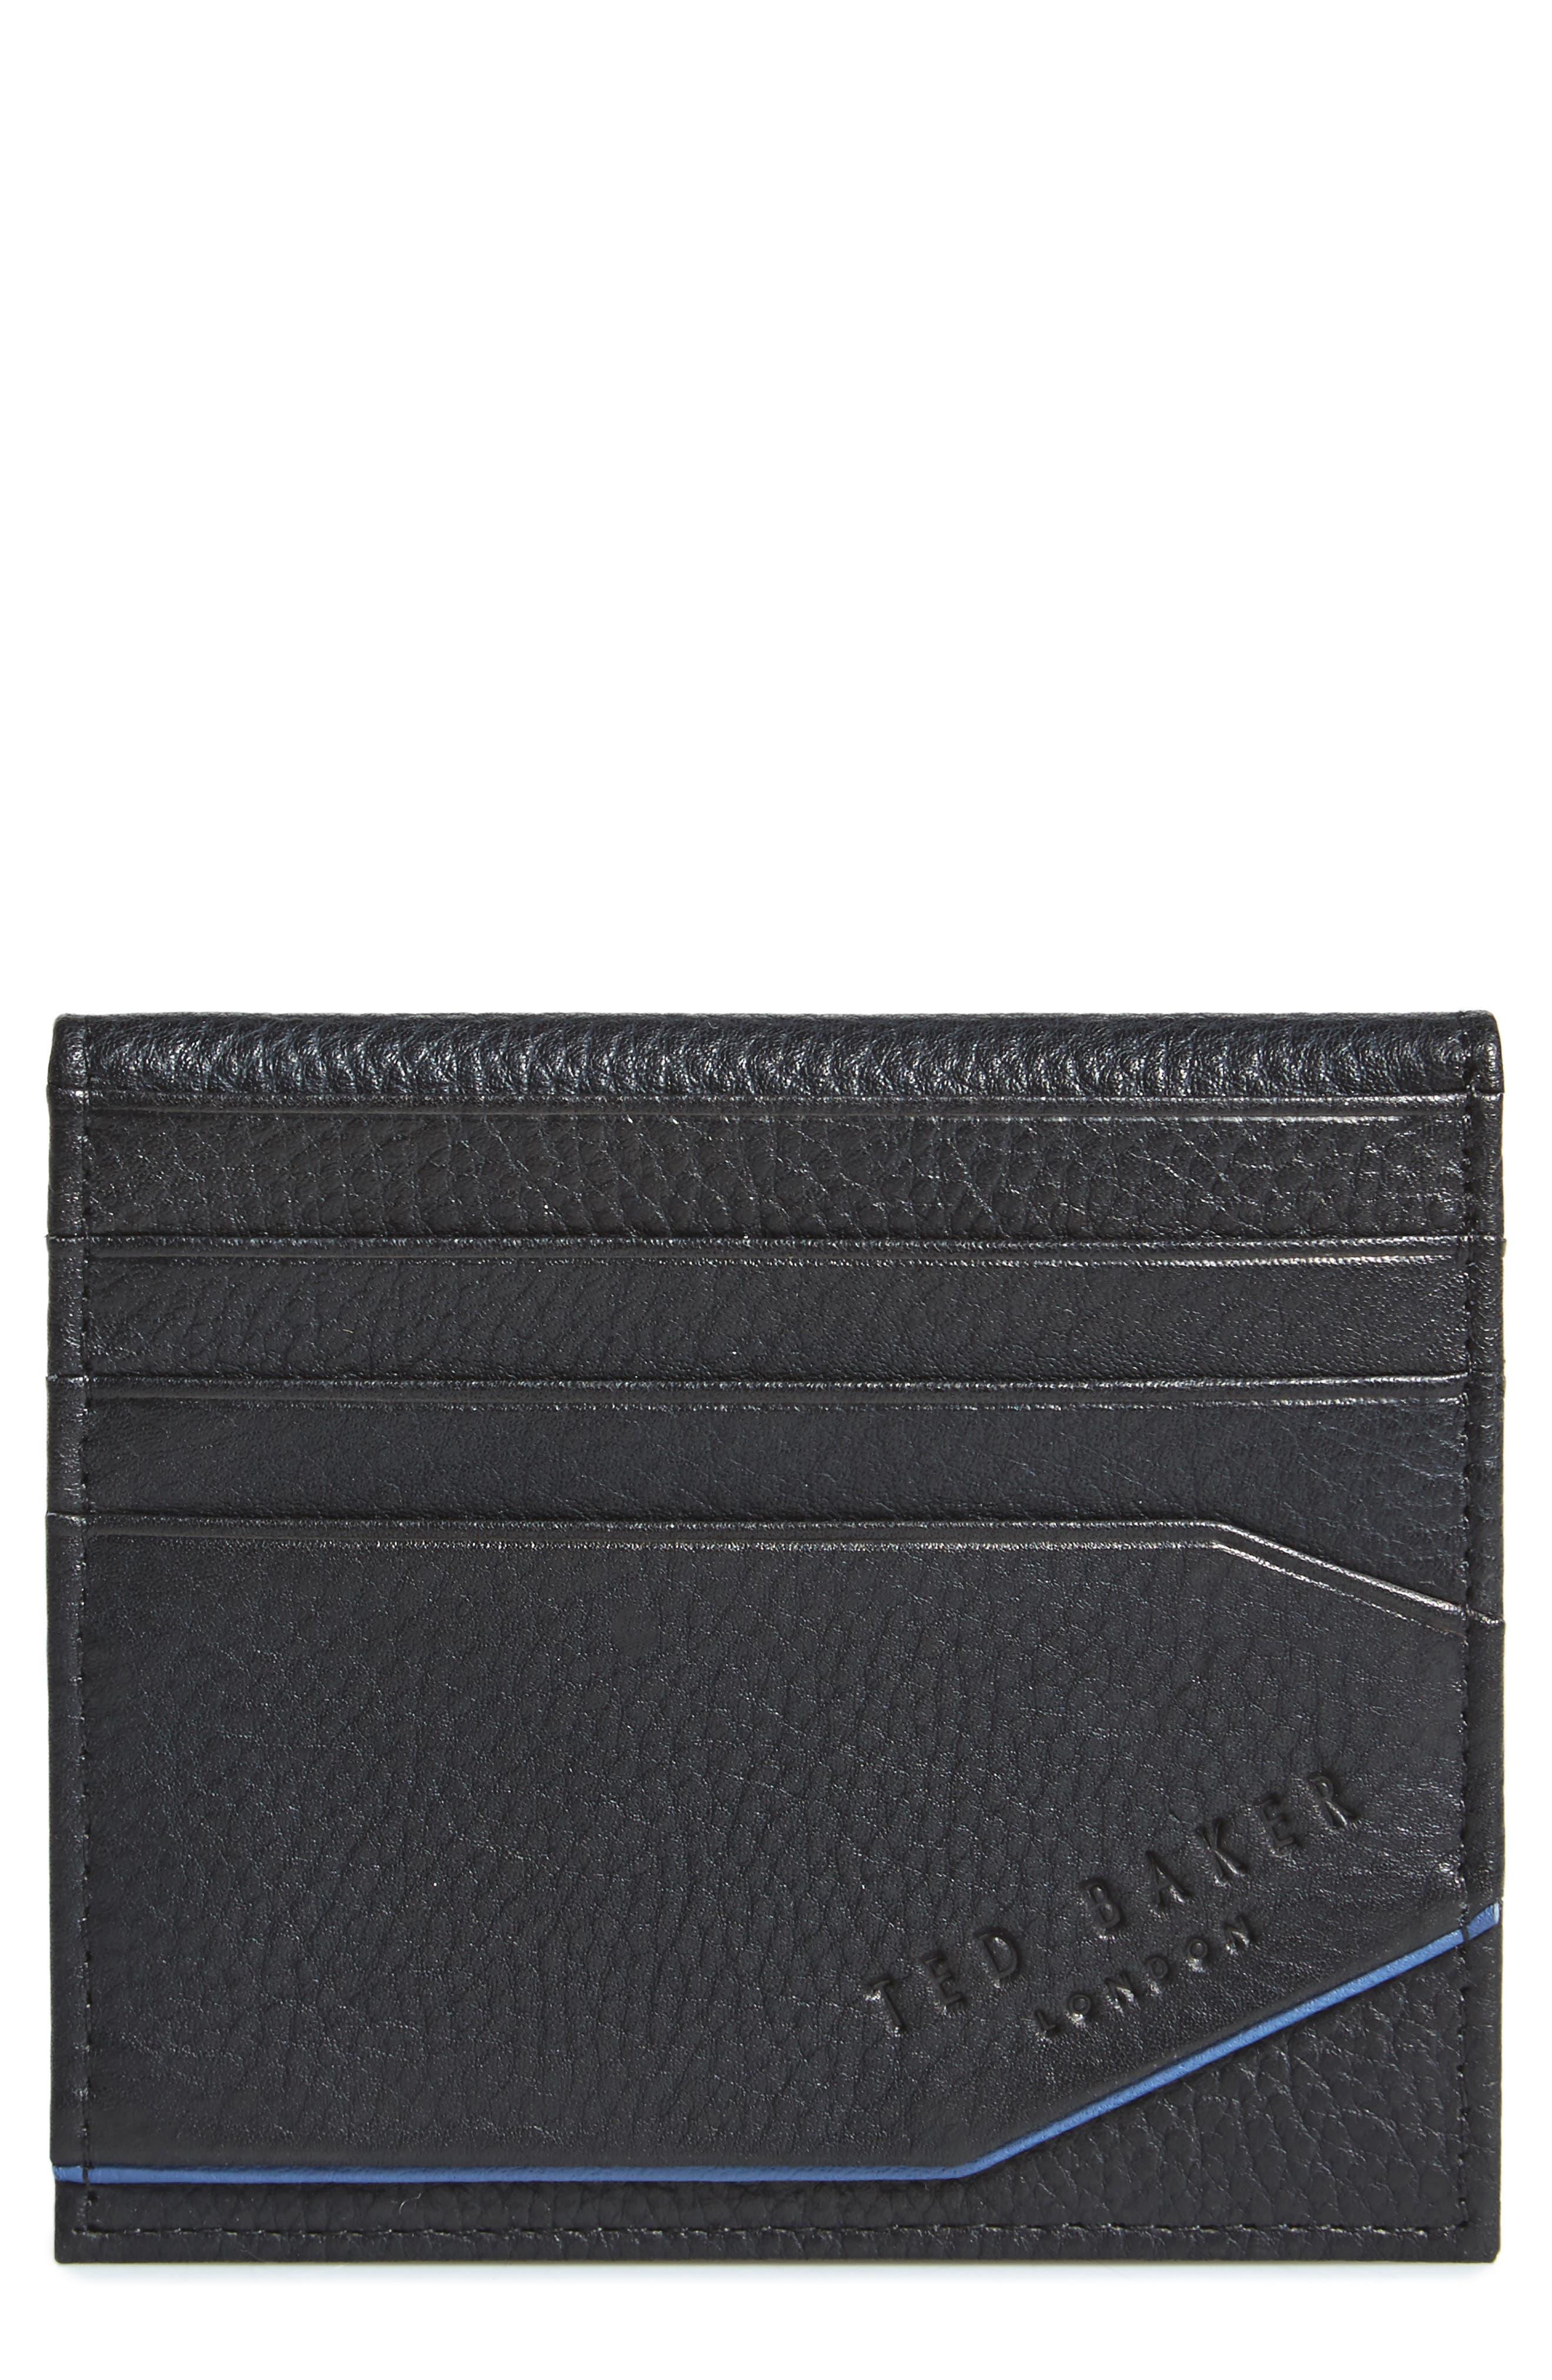 Ted Baker London Pyuma Leather Card Case